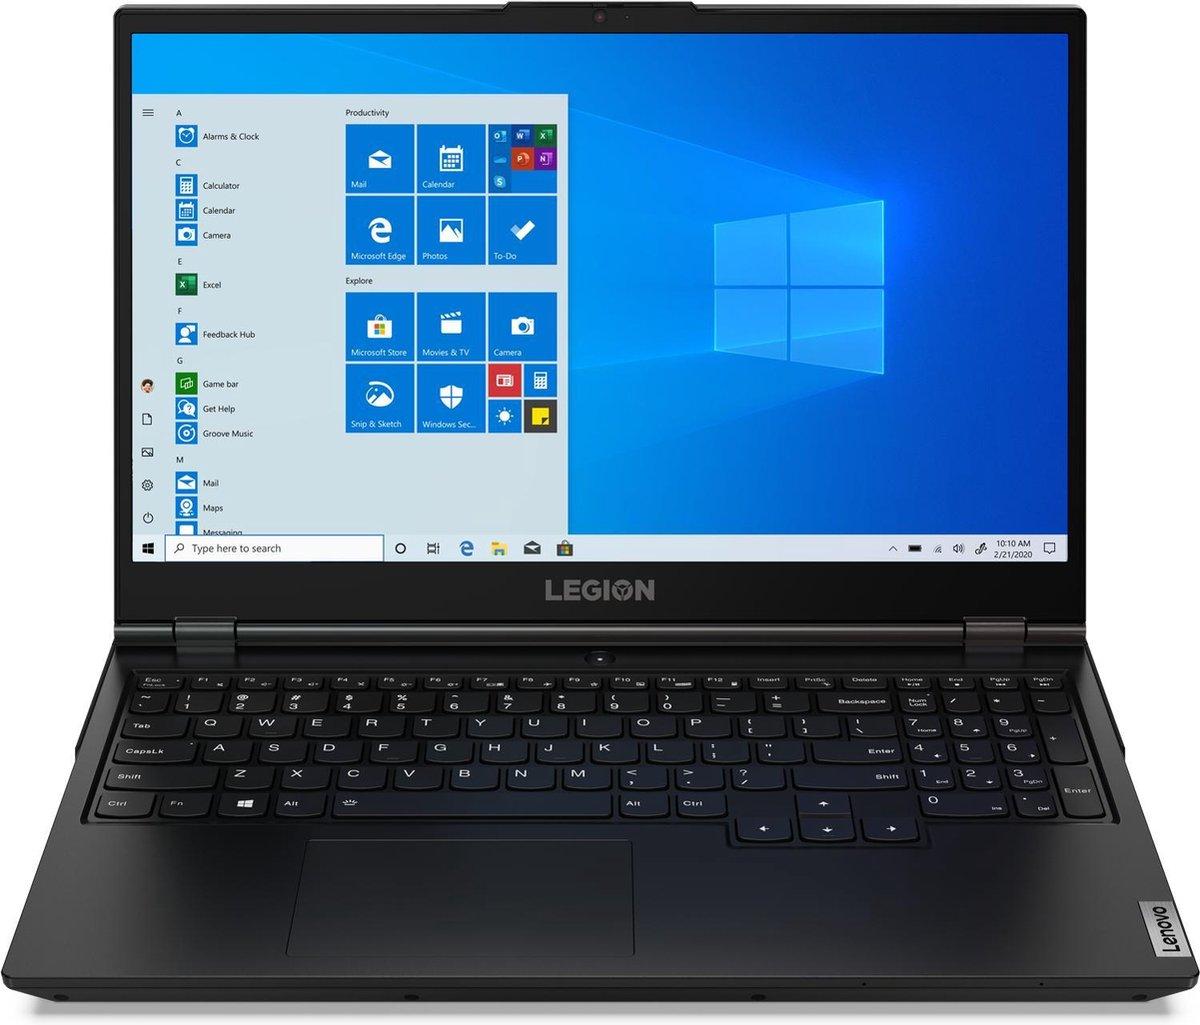 Lenovo Legion 5 82GN003QMH - Gaming Laptop - 17.3 Inch